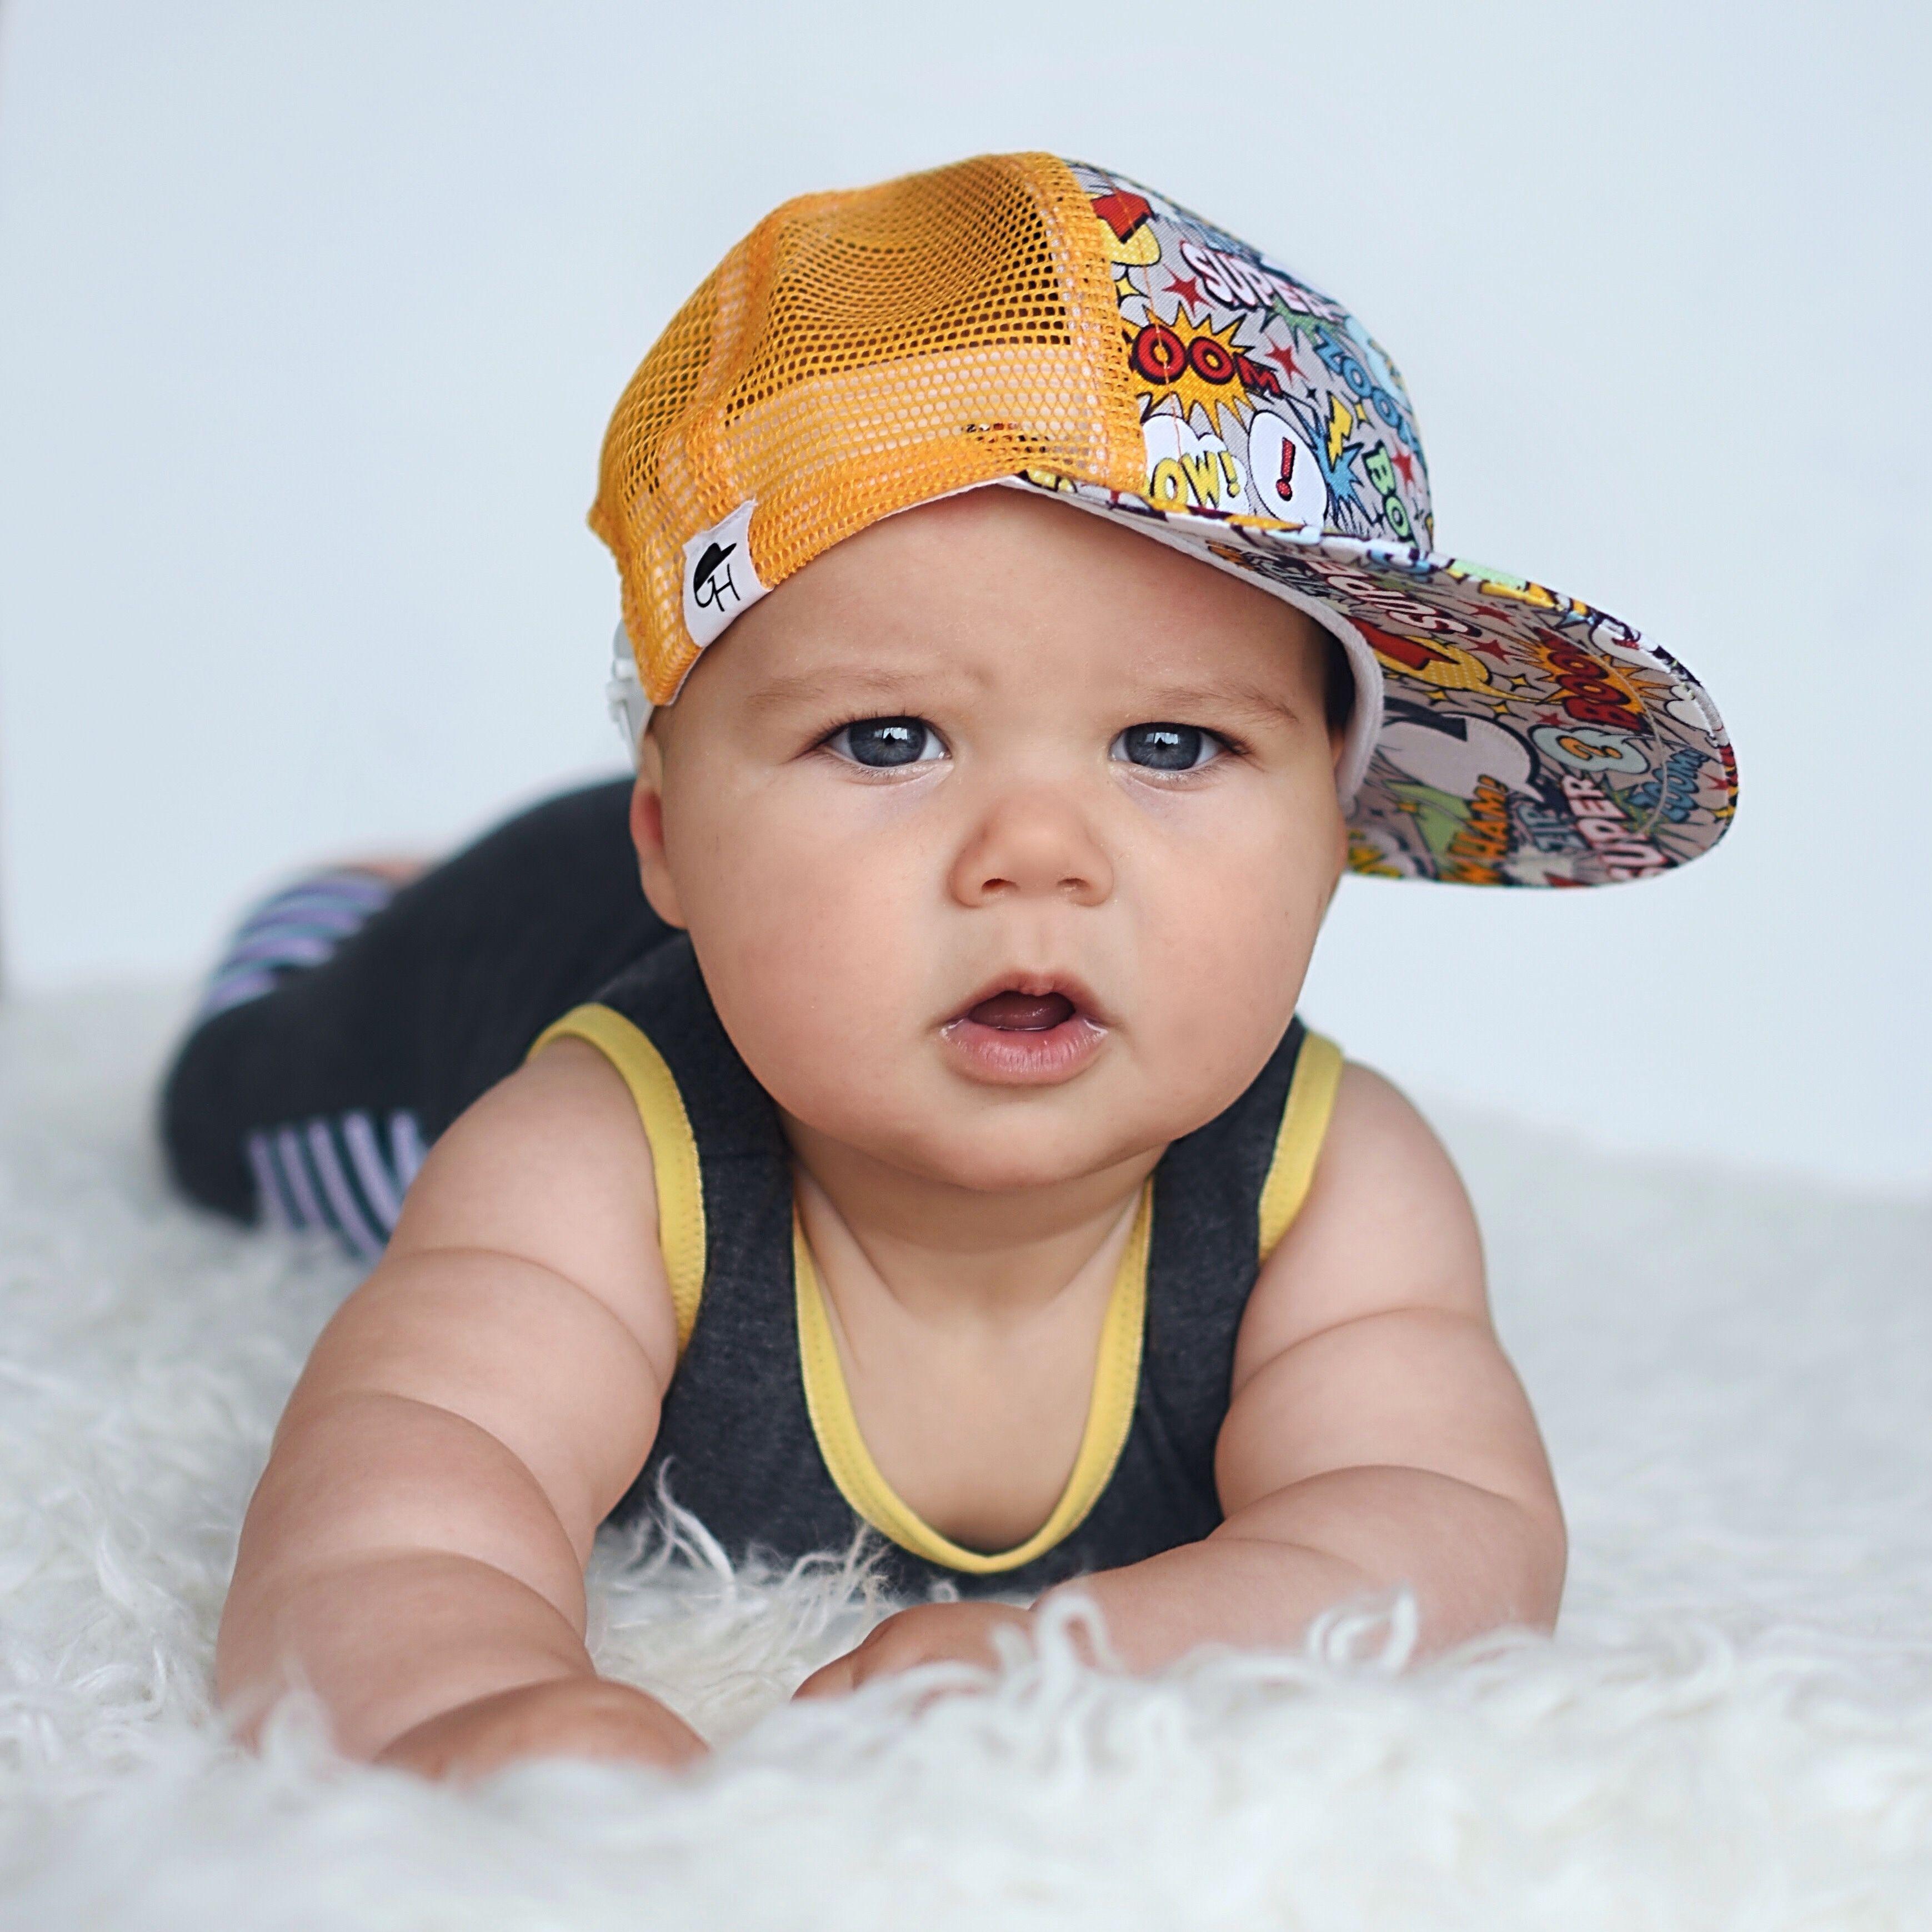 Comic Trucker George Hats George Hats Baby Boy Fashion Baby Sun Hat